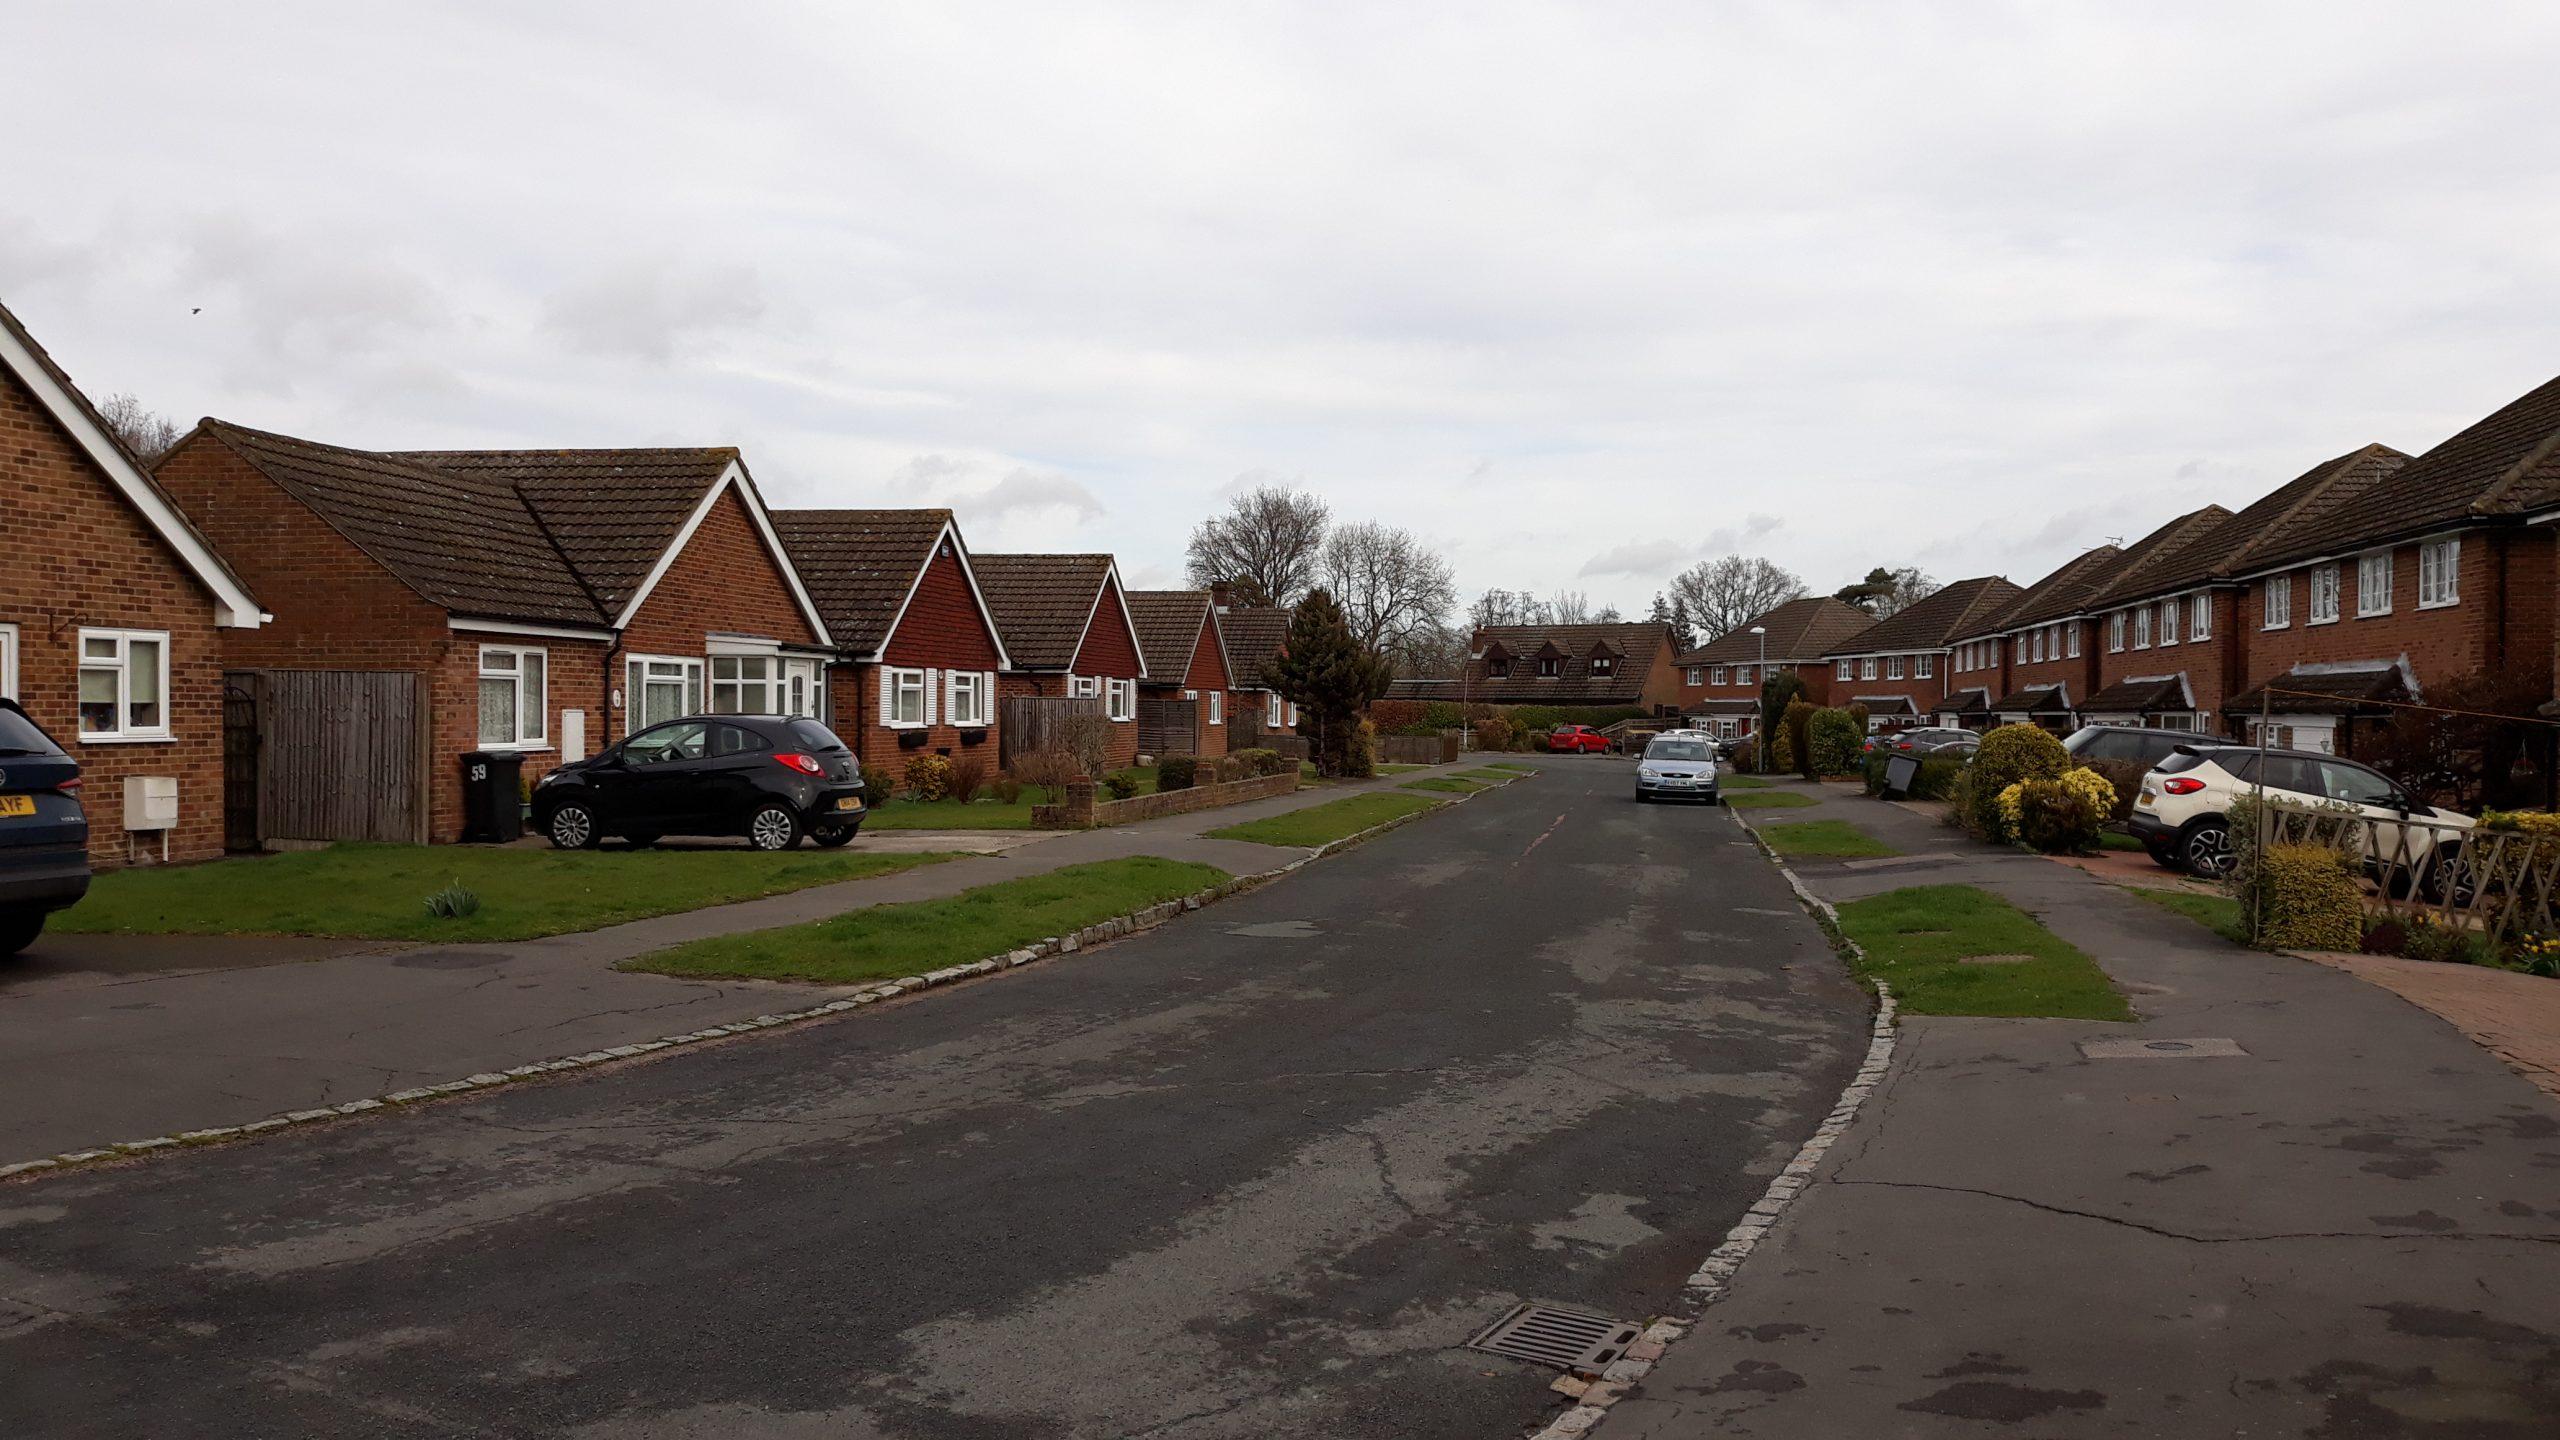 photograph of street scene along Ridgeway